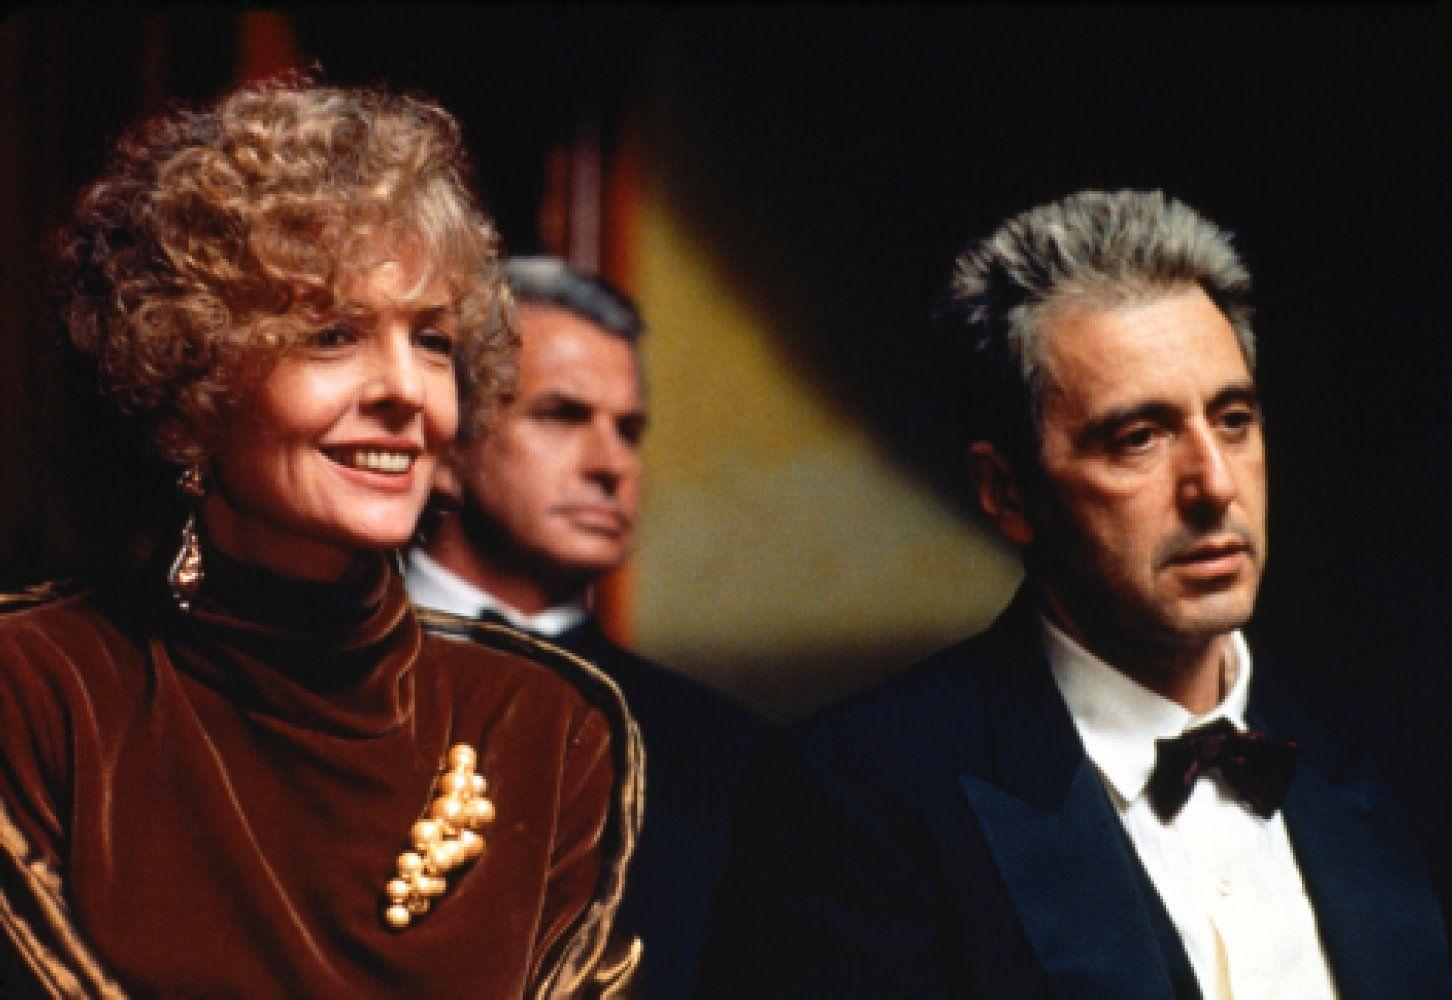 El Padrino Parte Iii 1990 Imdb The Godfather Part Iii Al